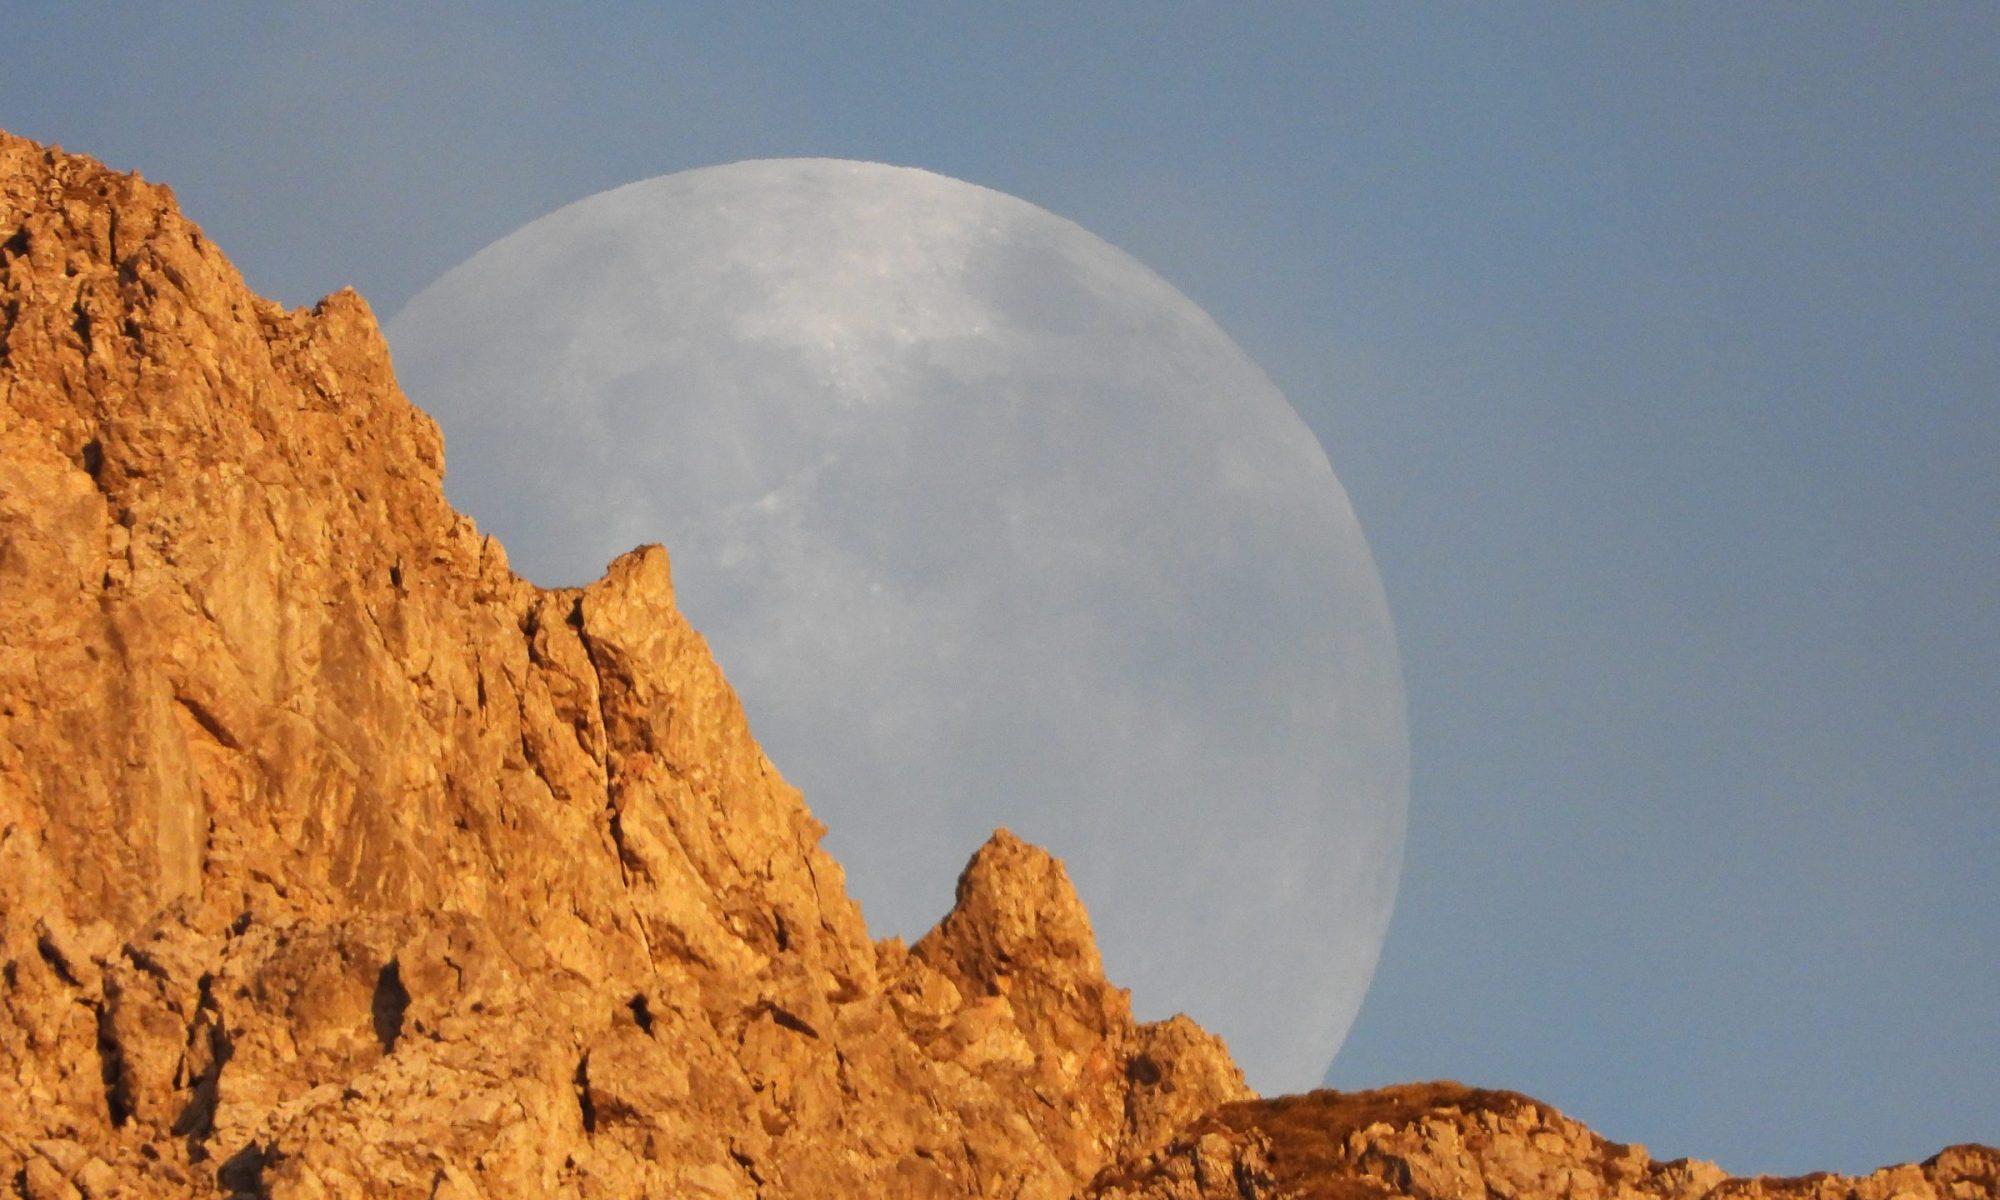 Maan achter berg Kleinwalsertal, Mond hinter Berg